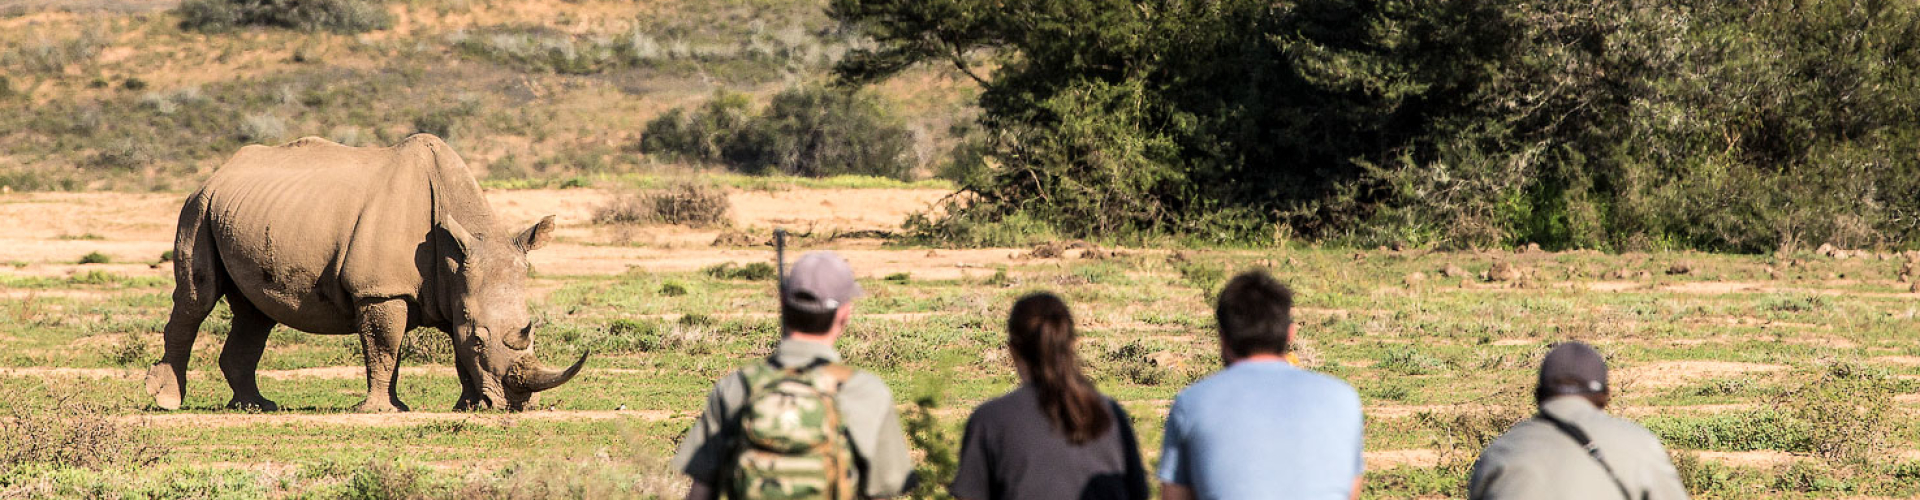 kwandwe-game-reserve-zuid-afrika-big-five-neushoorn